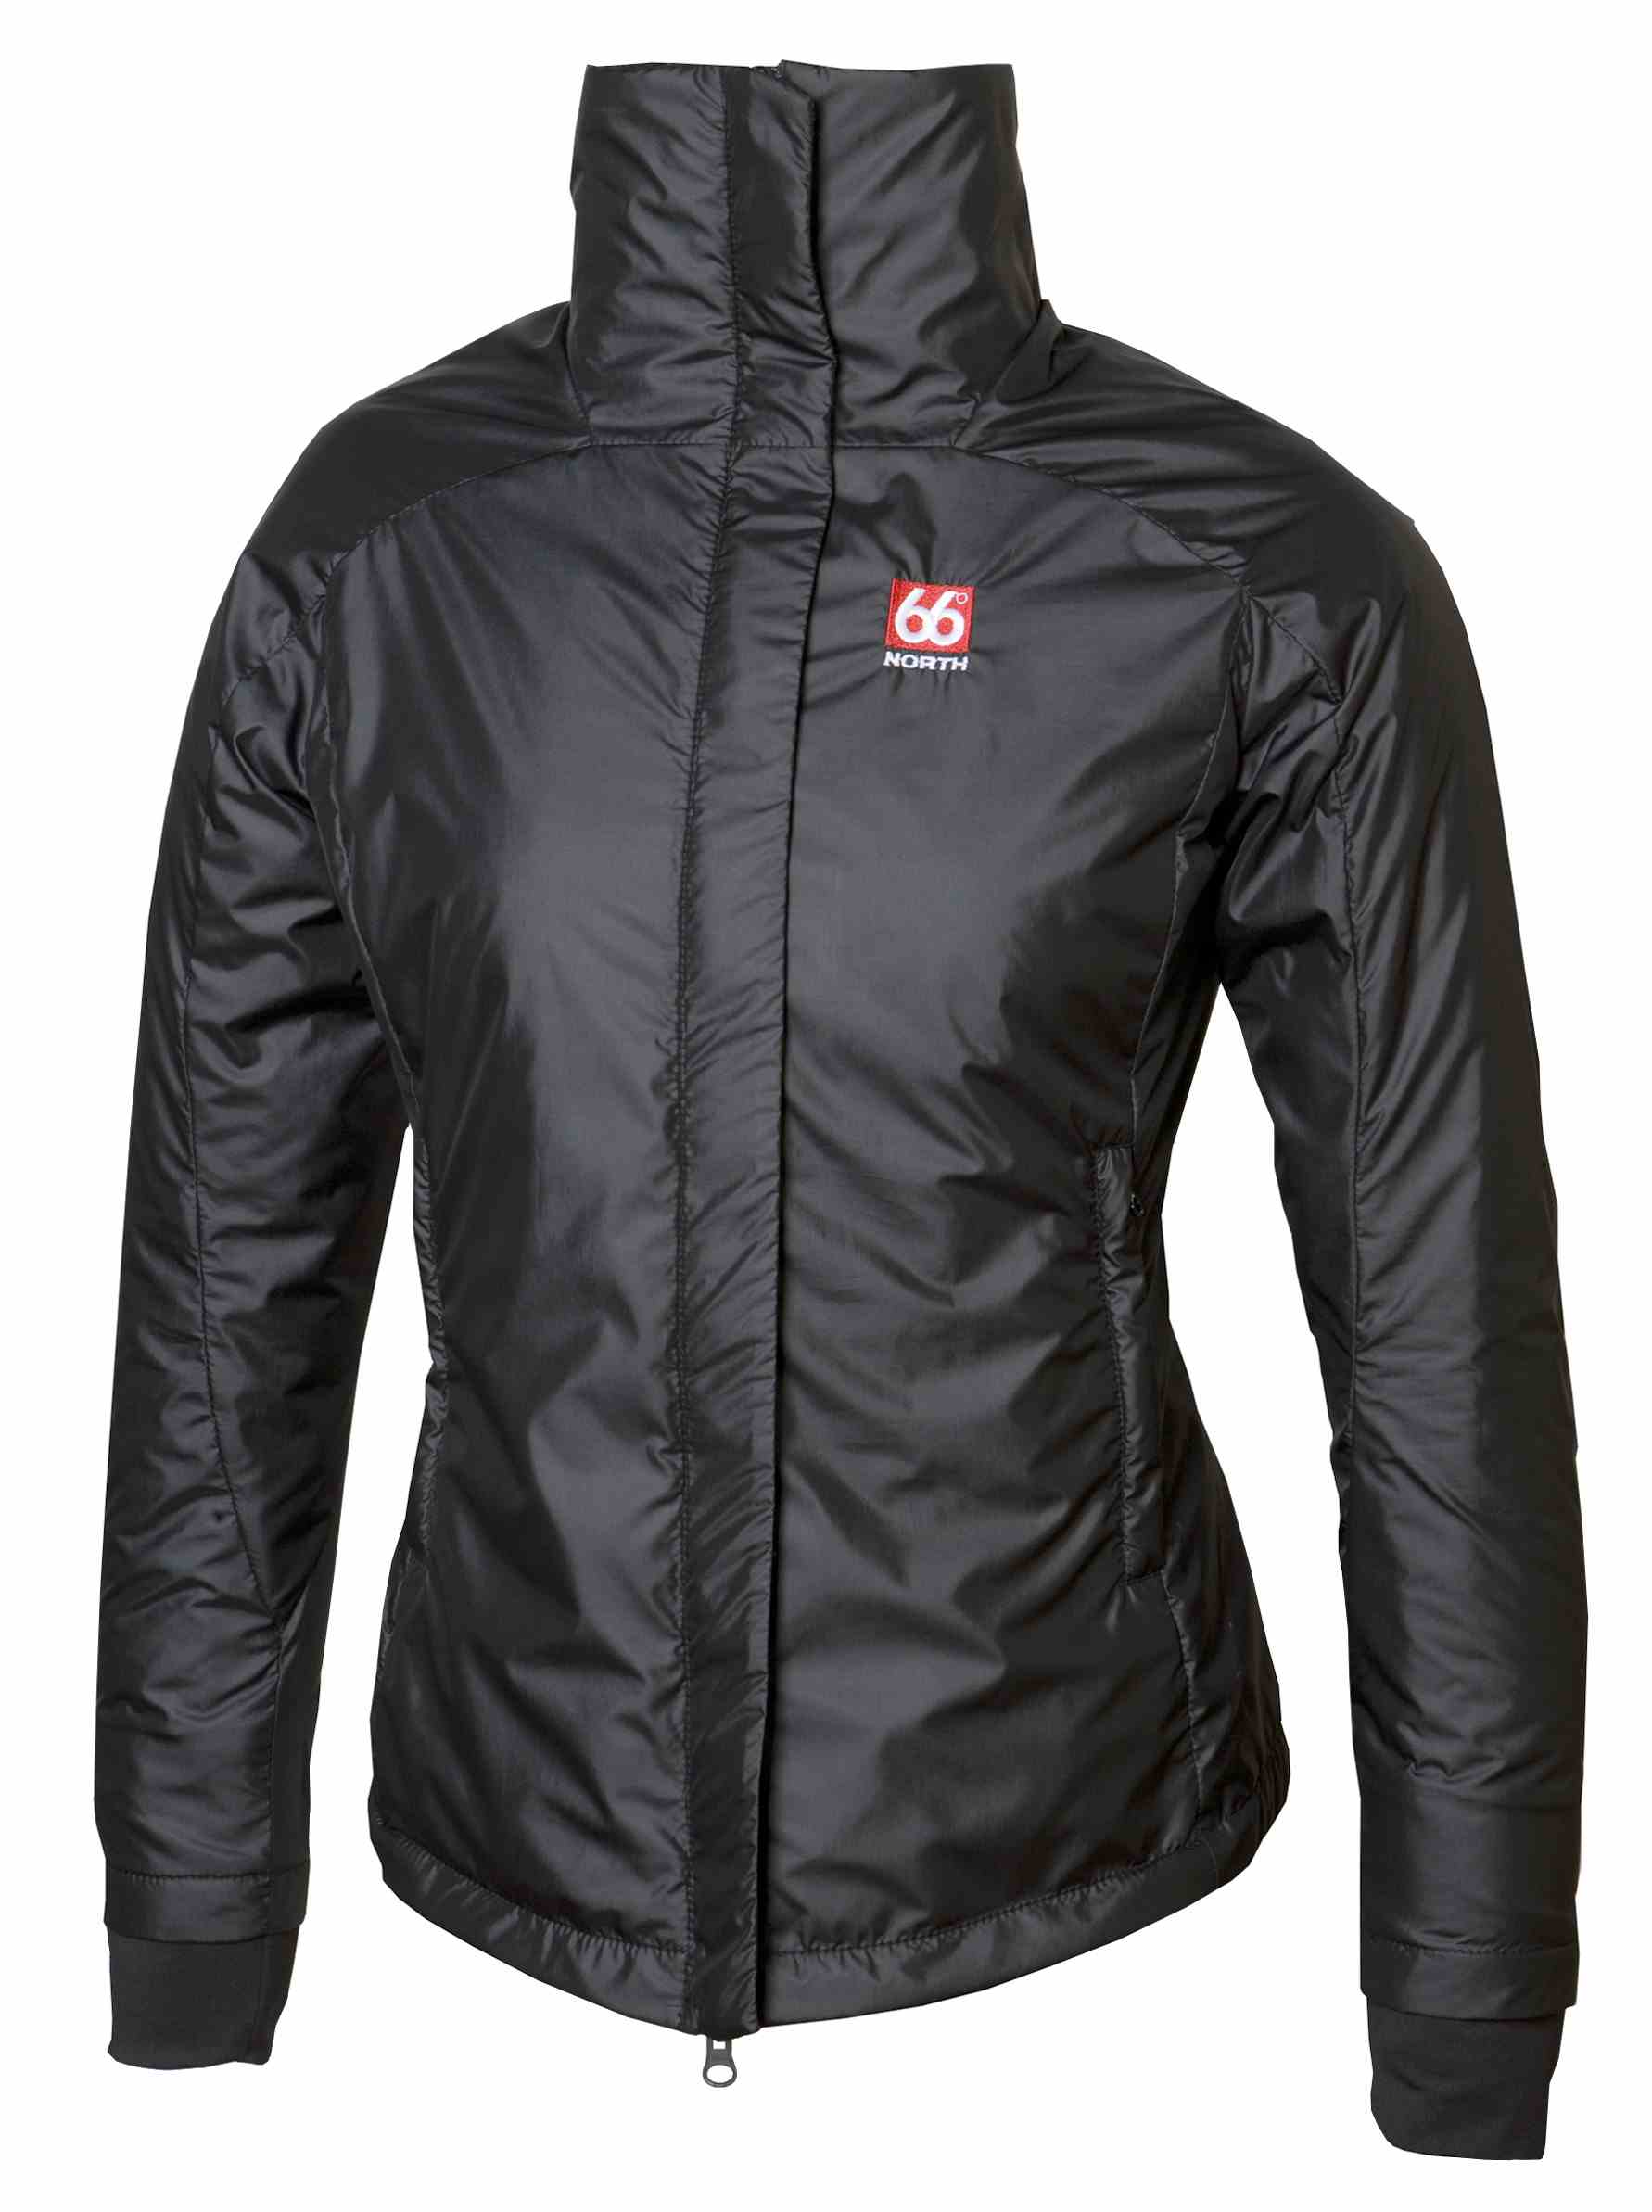 66º North women's Eyjafjallajokull Jacket with Polartecr Alphar